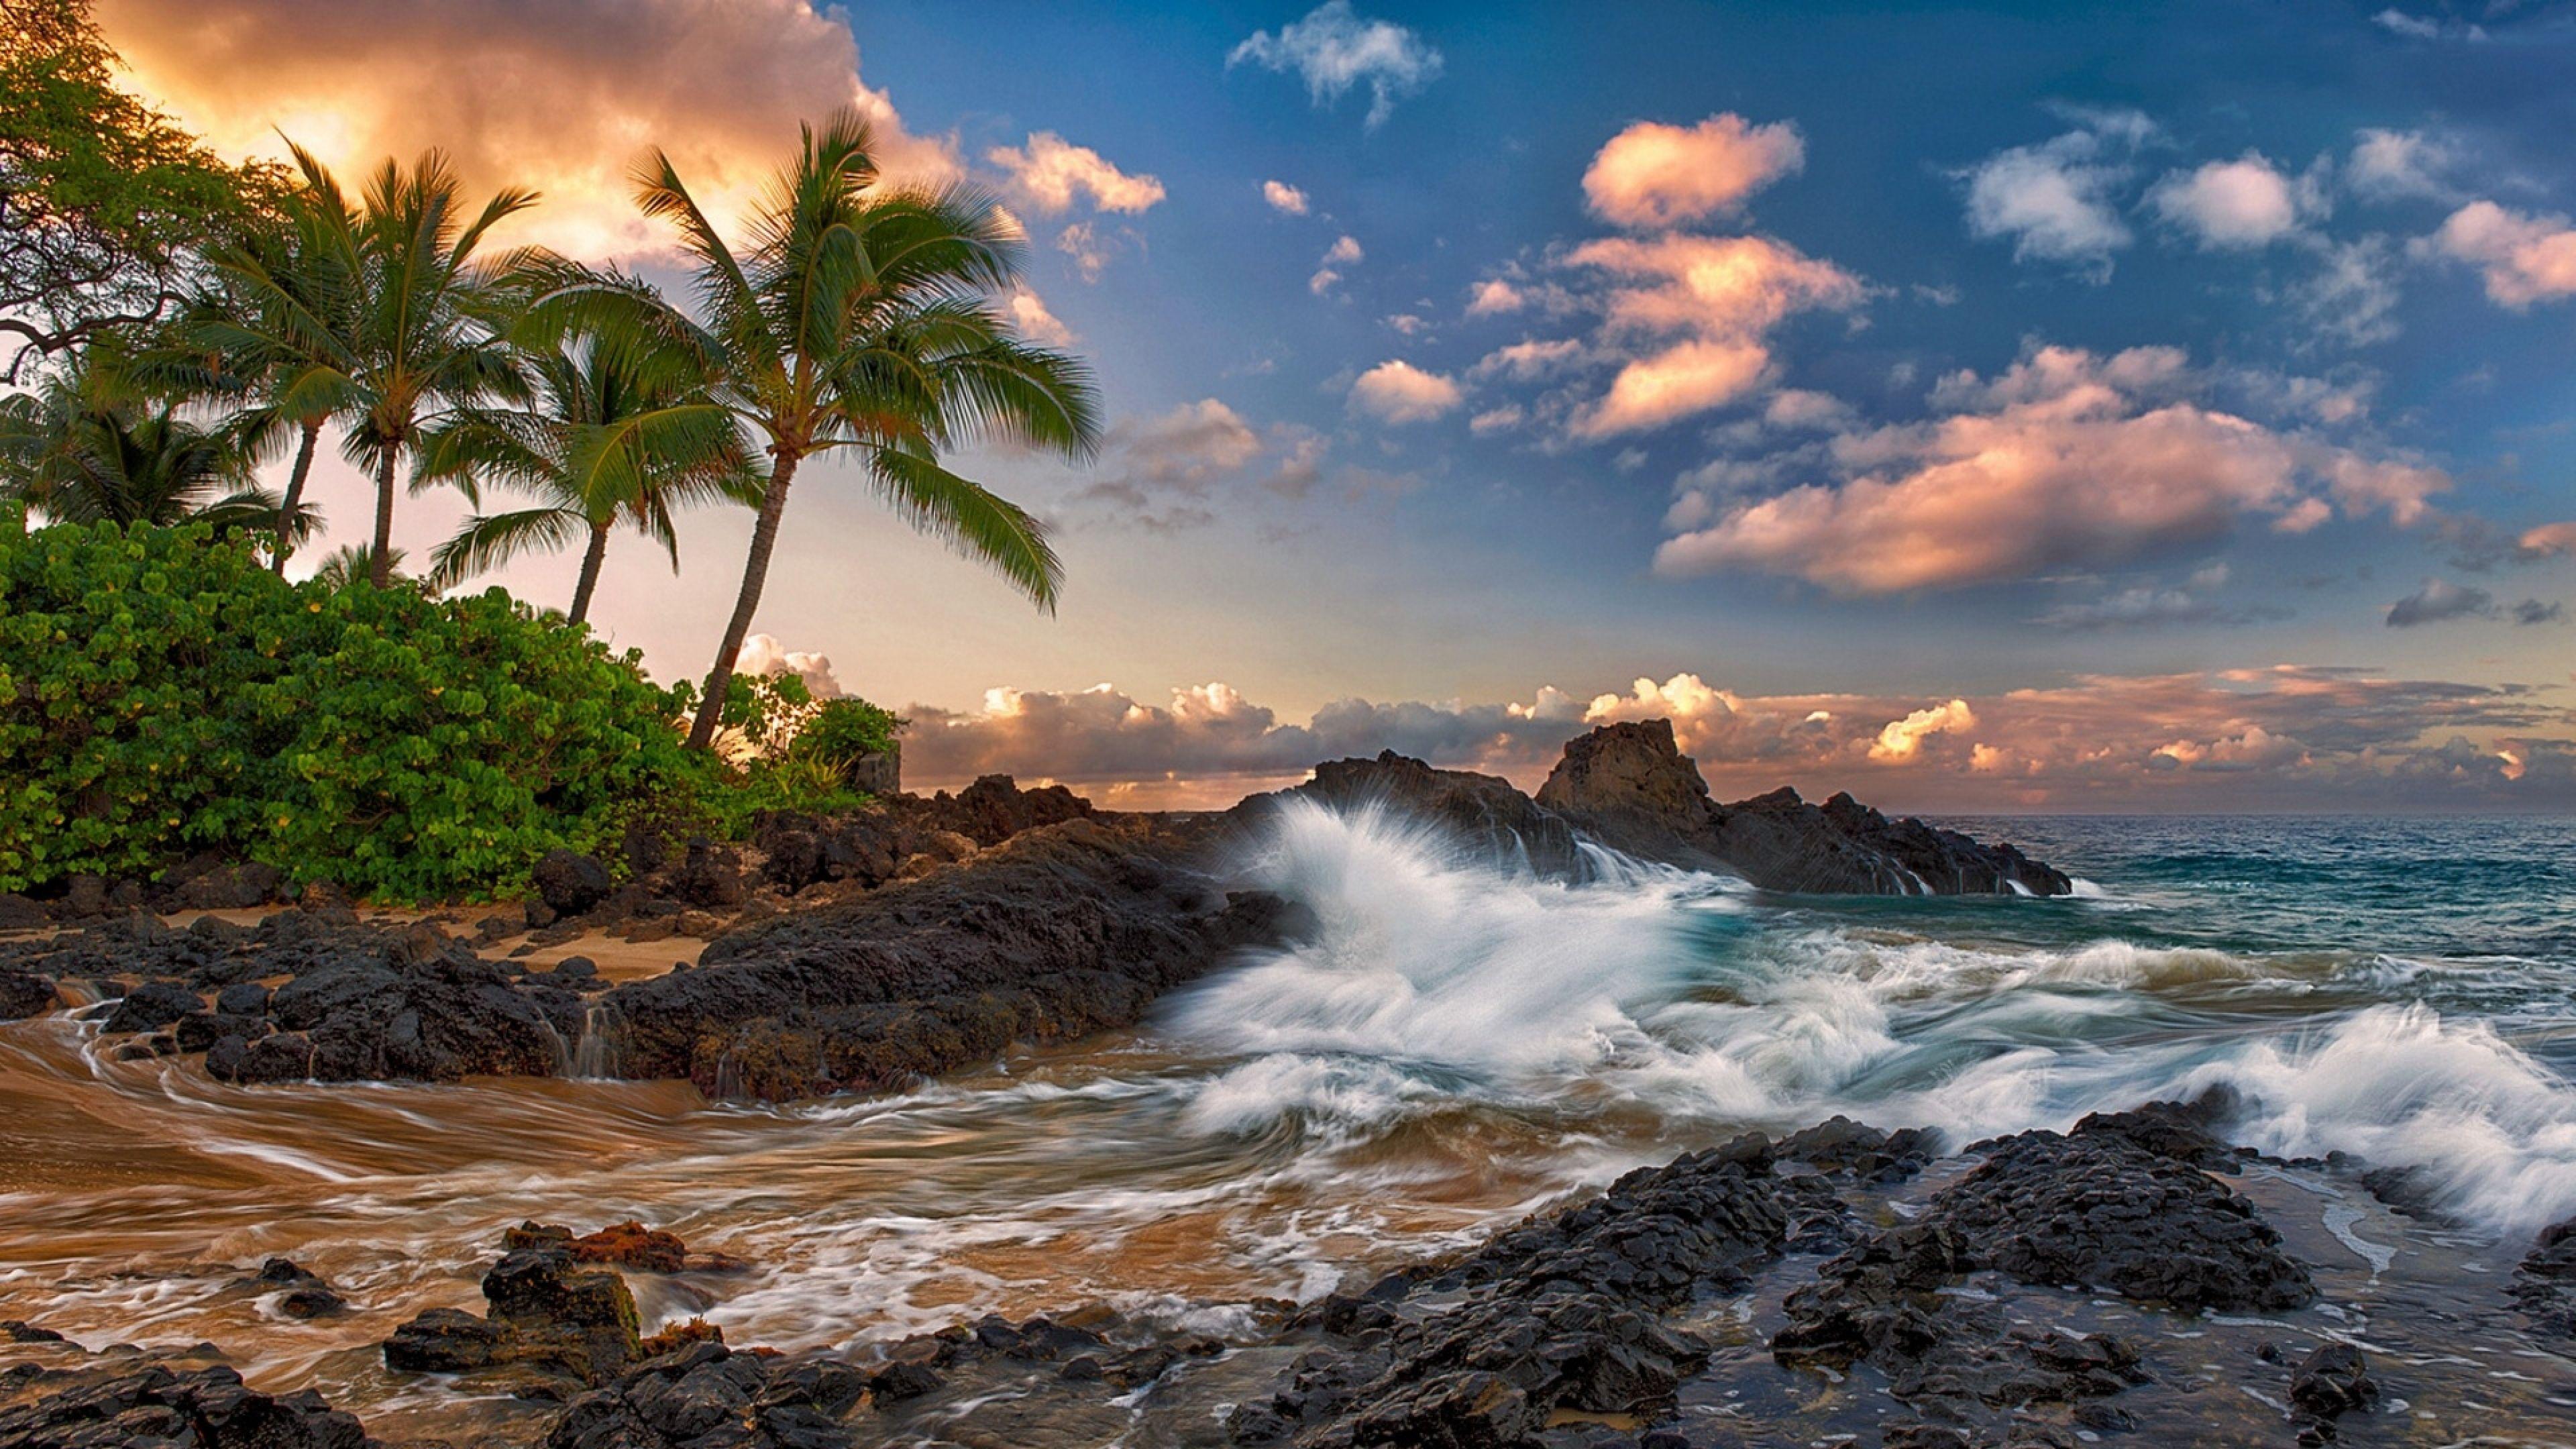 3840x2160 Wallpaper Maui Hawaii Pacific Ocean Rock Surf Rocks Palm Trees Clouds Tropical Coast Hawaii Landscape Maui Island Hawaii Ocean Images